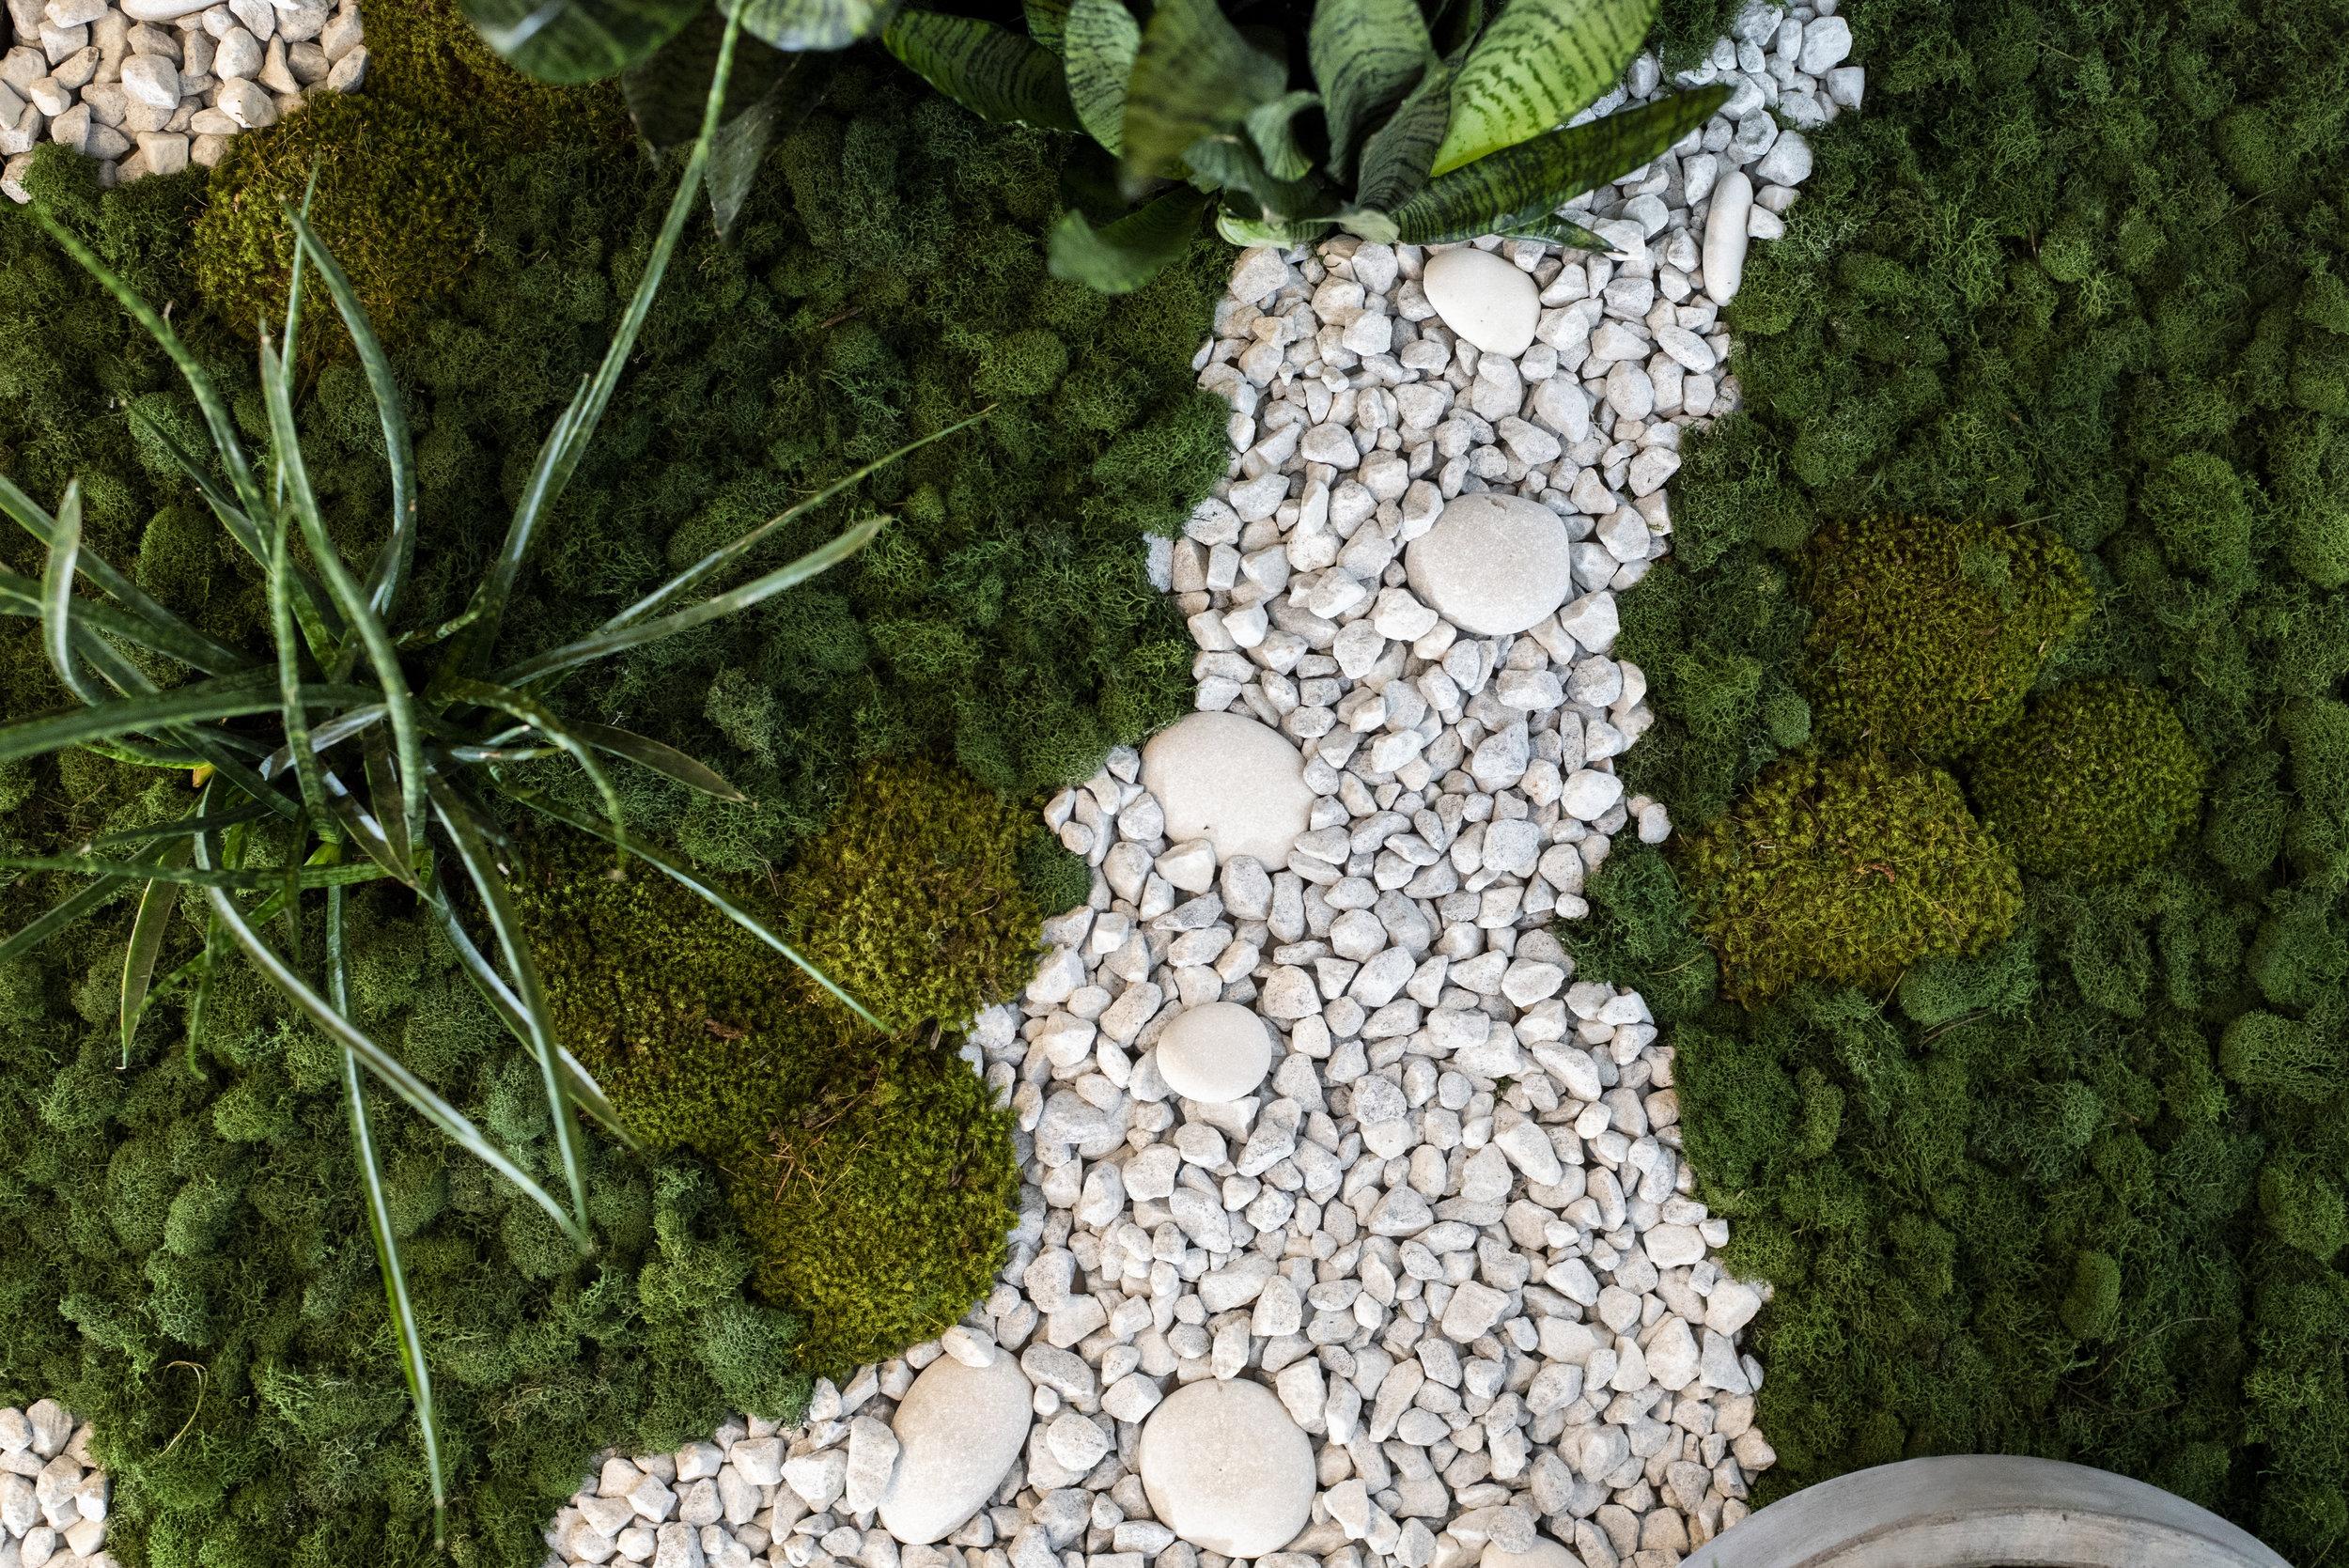 moss-floor-patterns.jpg